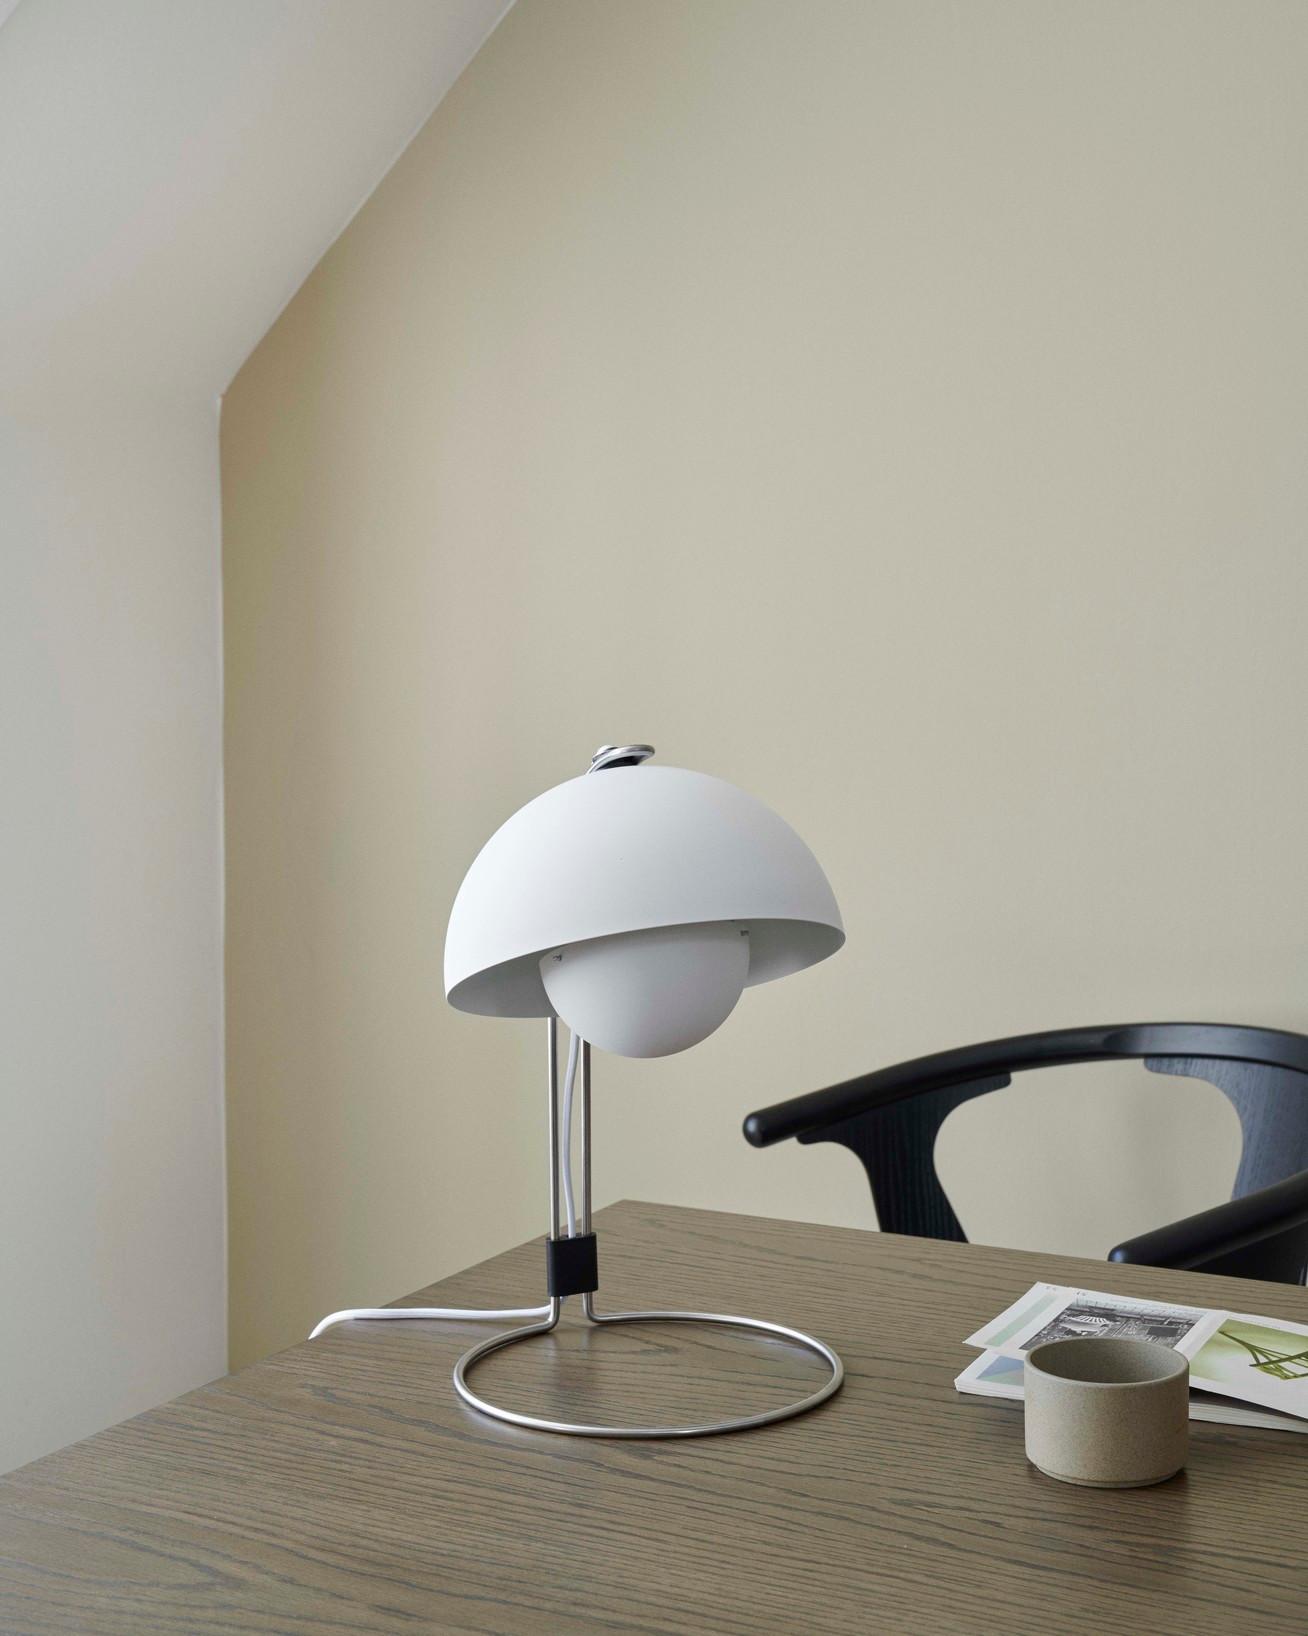 Picture of: Flowerpot Bordlampe Kob Verner Panton Vp4 Lampe Her